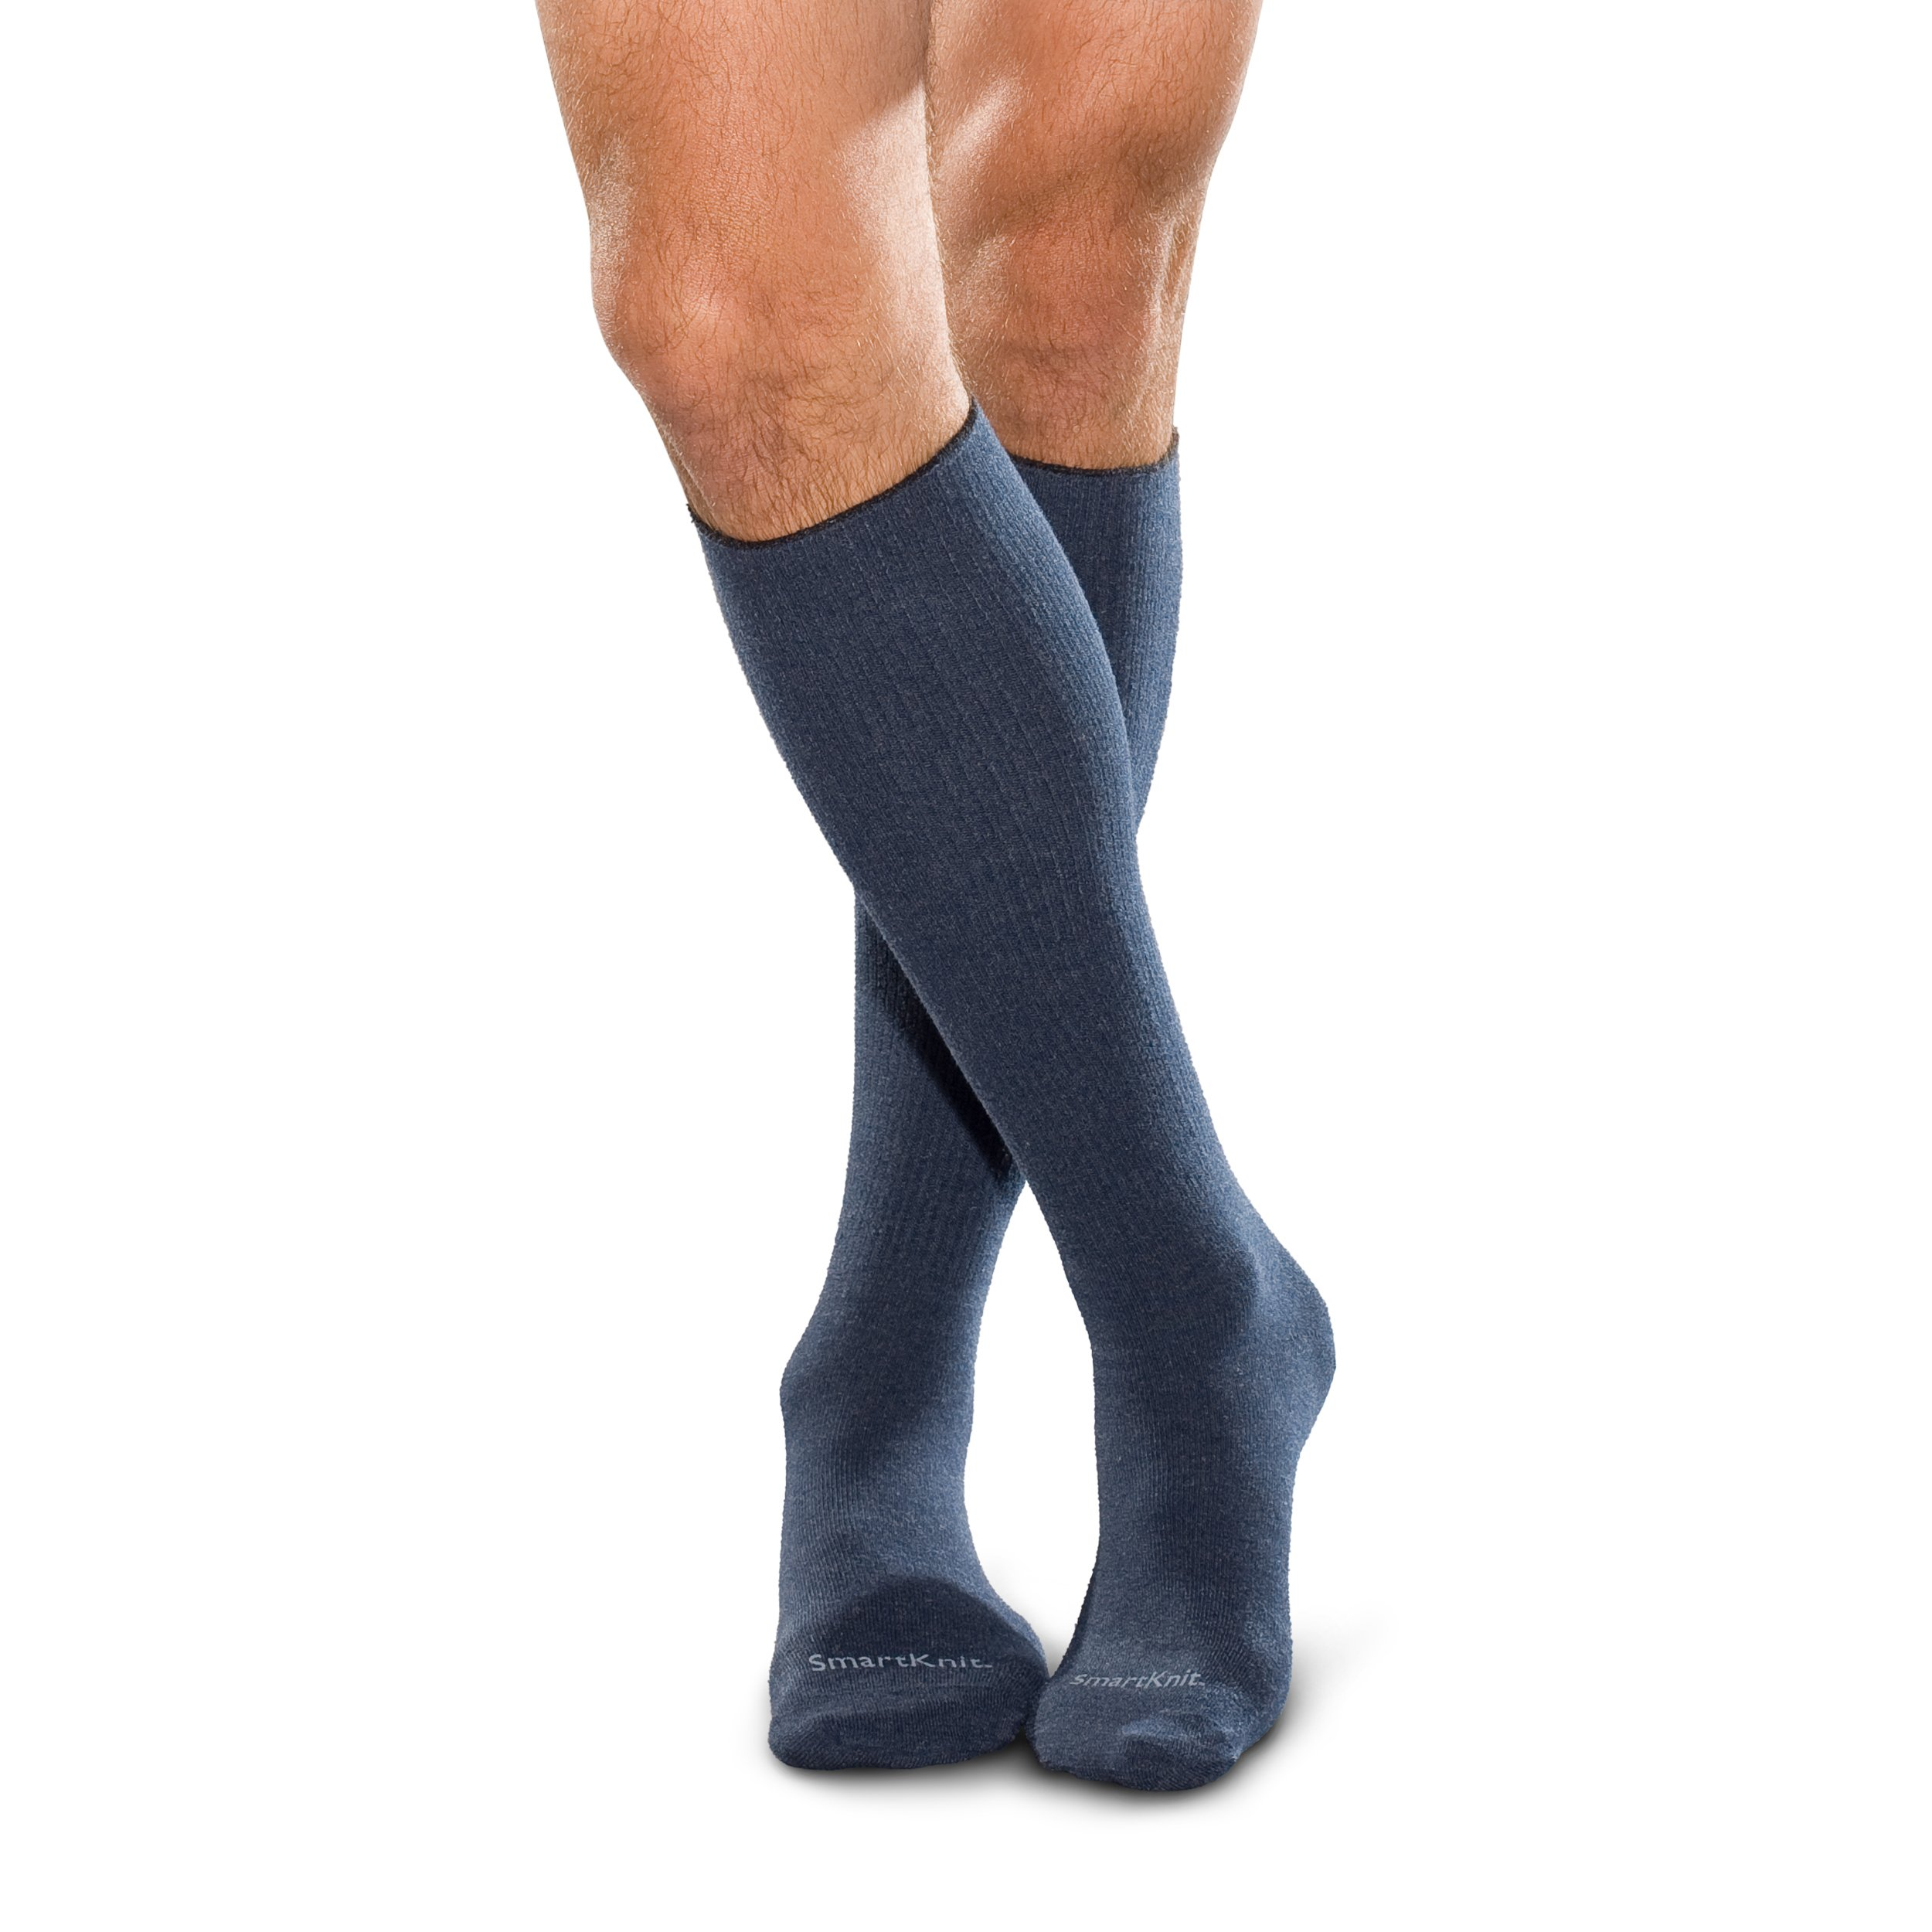 SmartKnit Seamless Over-the-Calf Socks for Diabetes, Arthritis or Sensitive Feet (Navy, Medium)